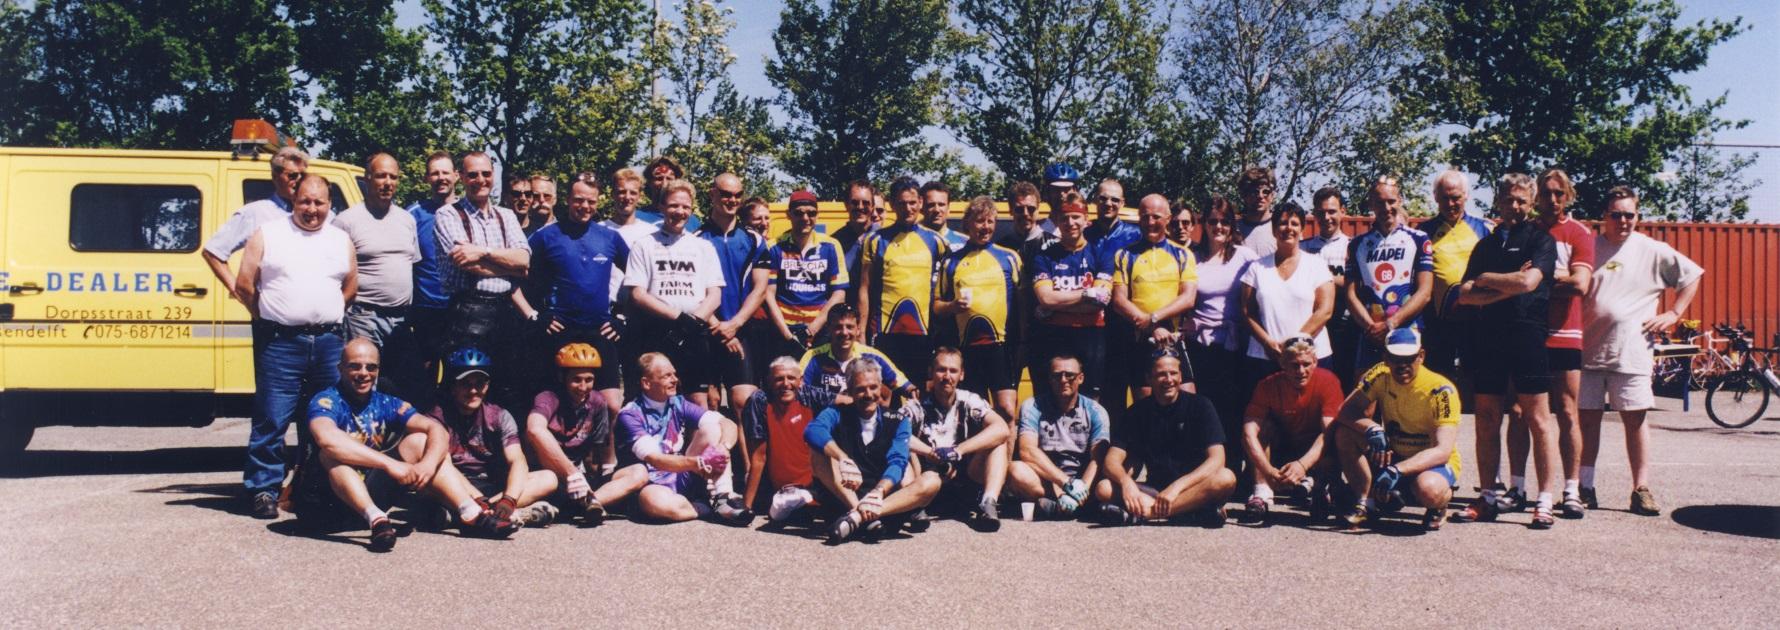 Groepsfoto 2001